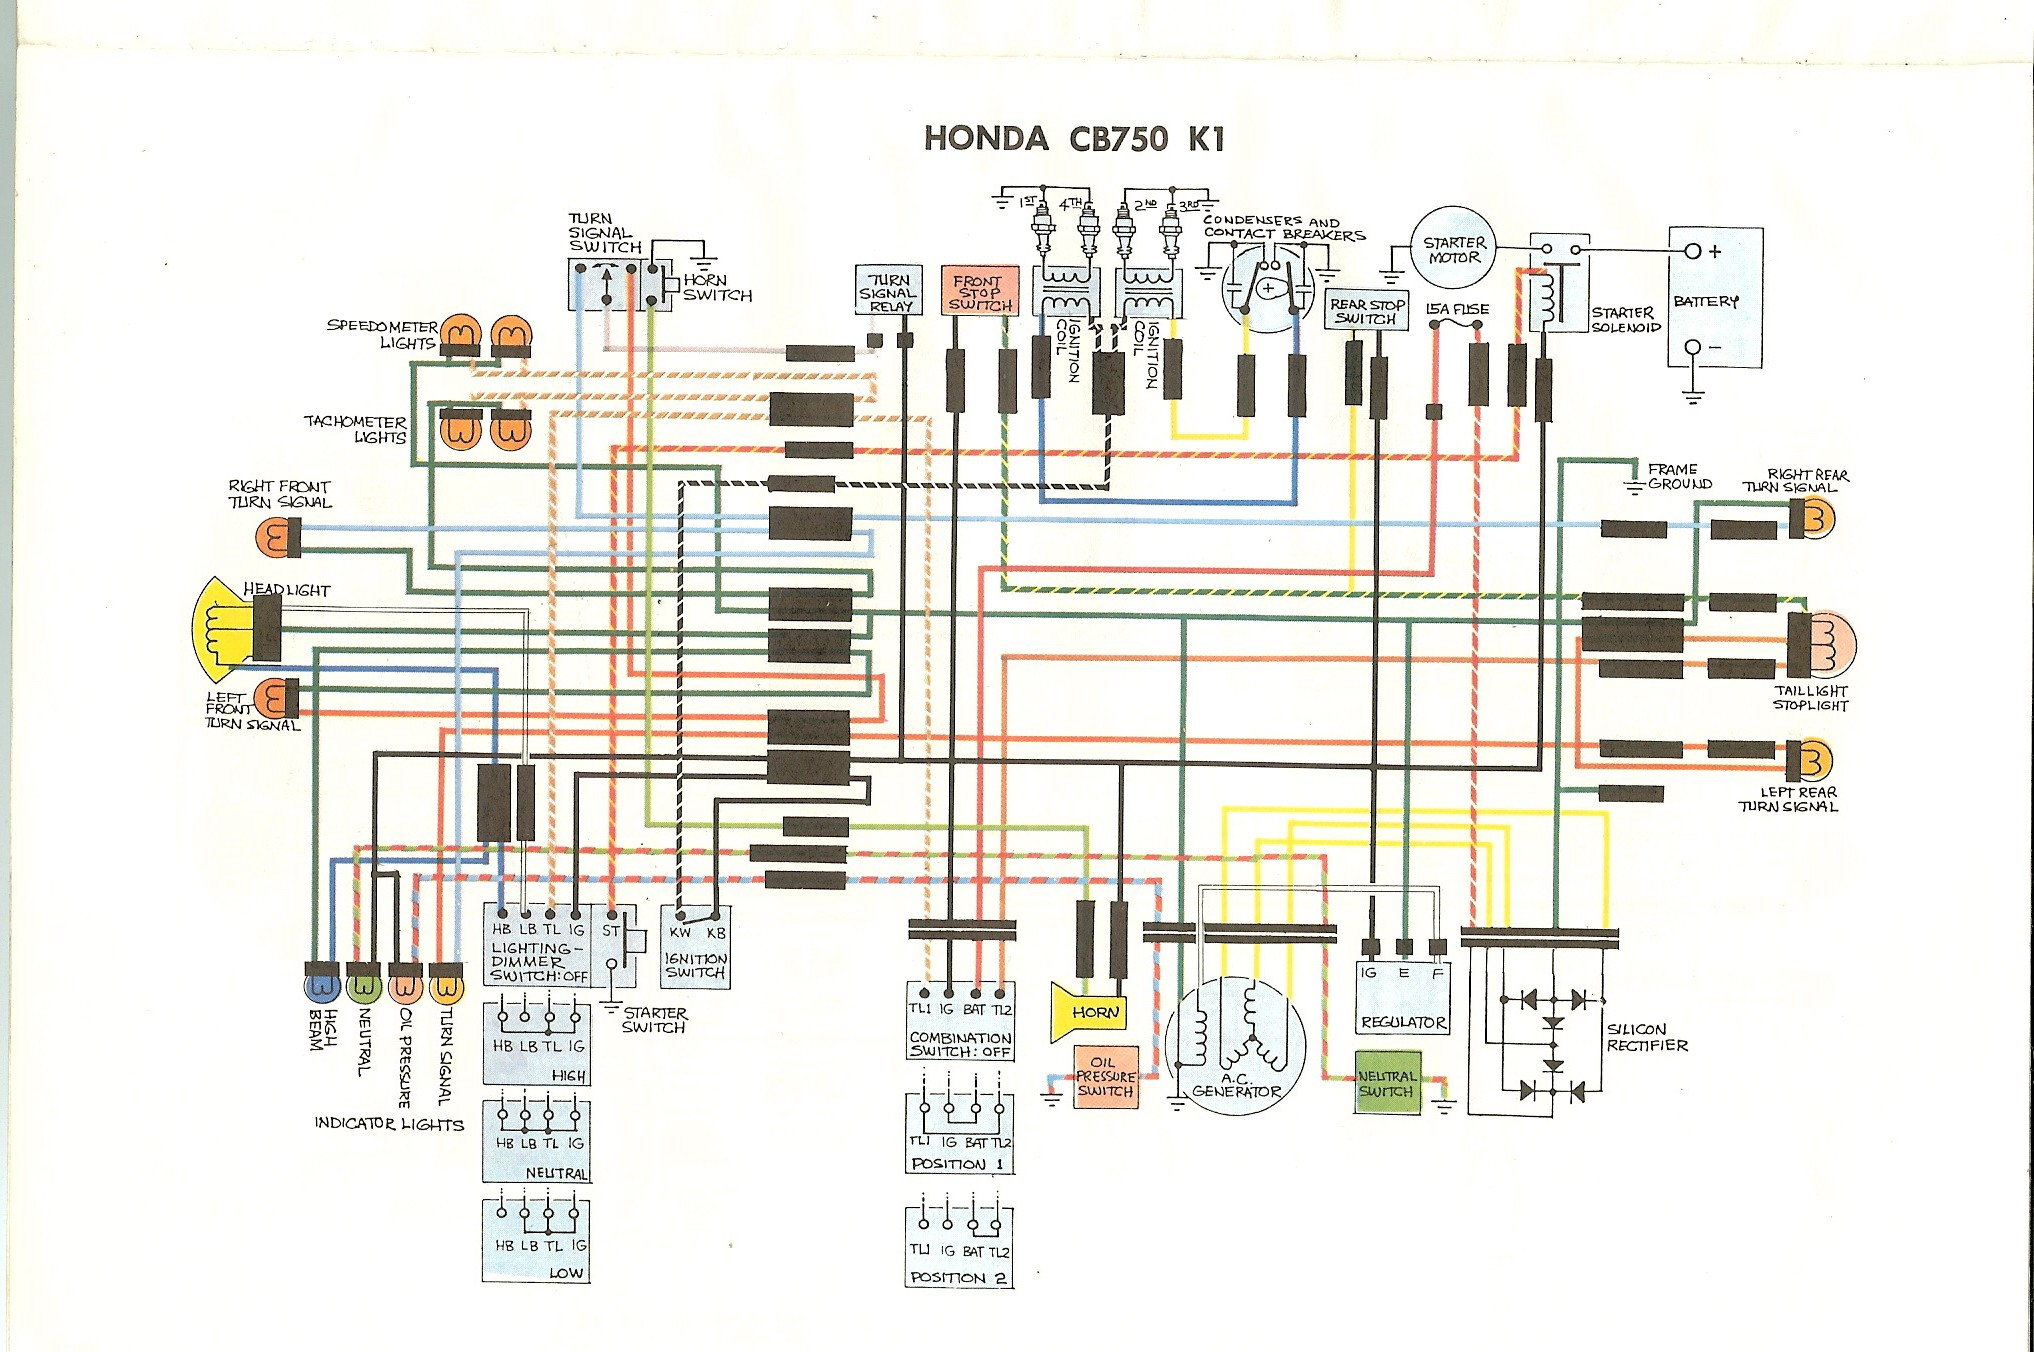 Honda Cb750 Engine Diagram Simple Motorcycle Wiring Diagram For